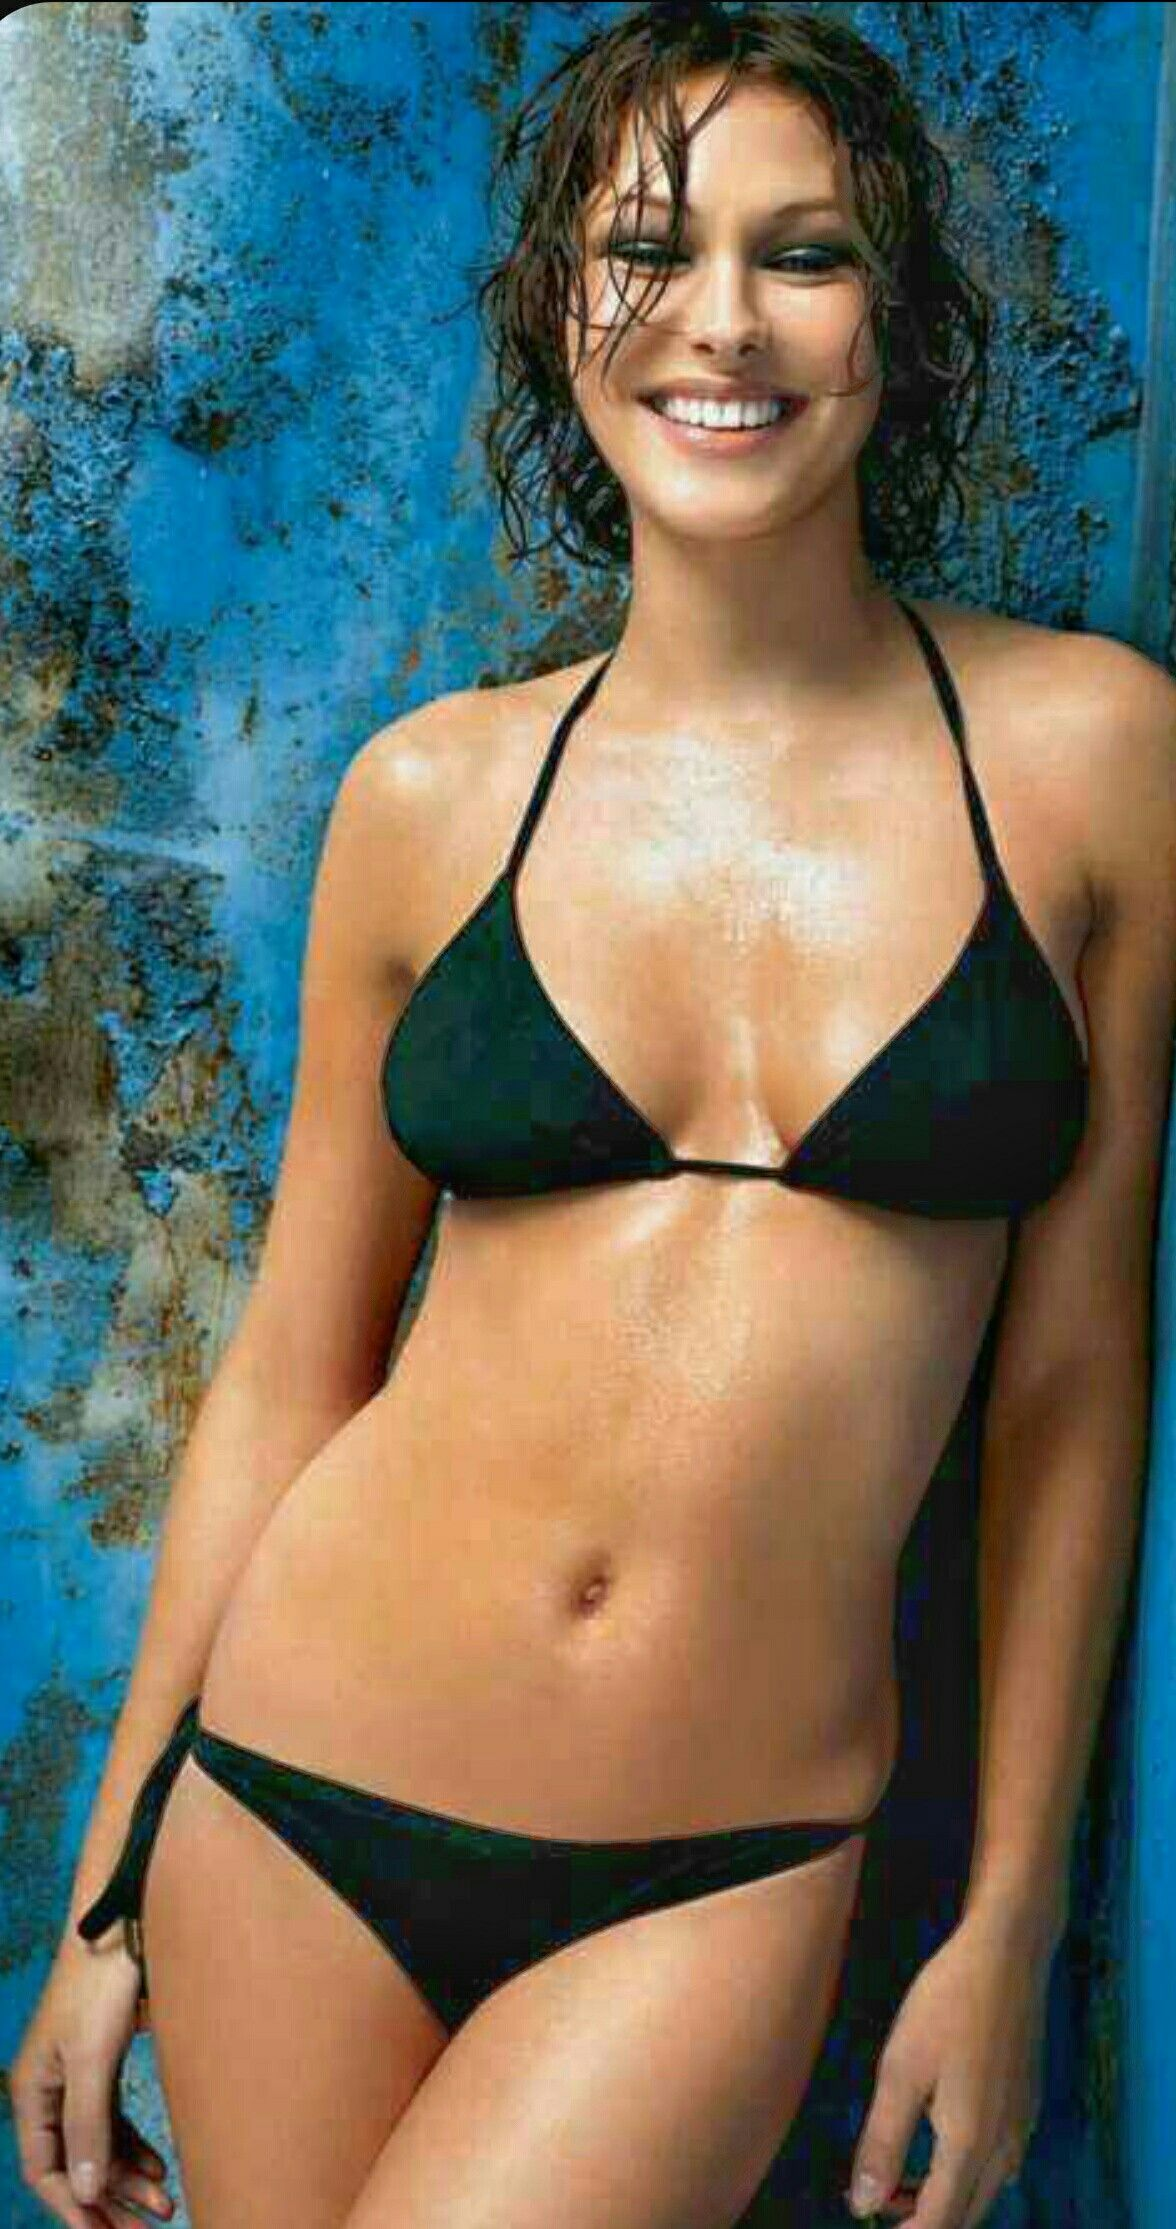 Bikini Emma Willis nude photos 2019